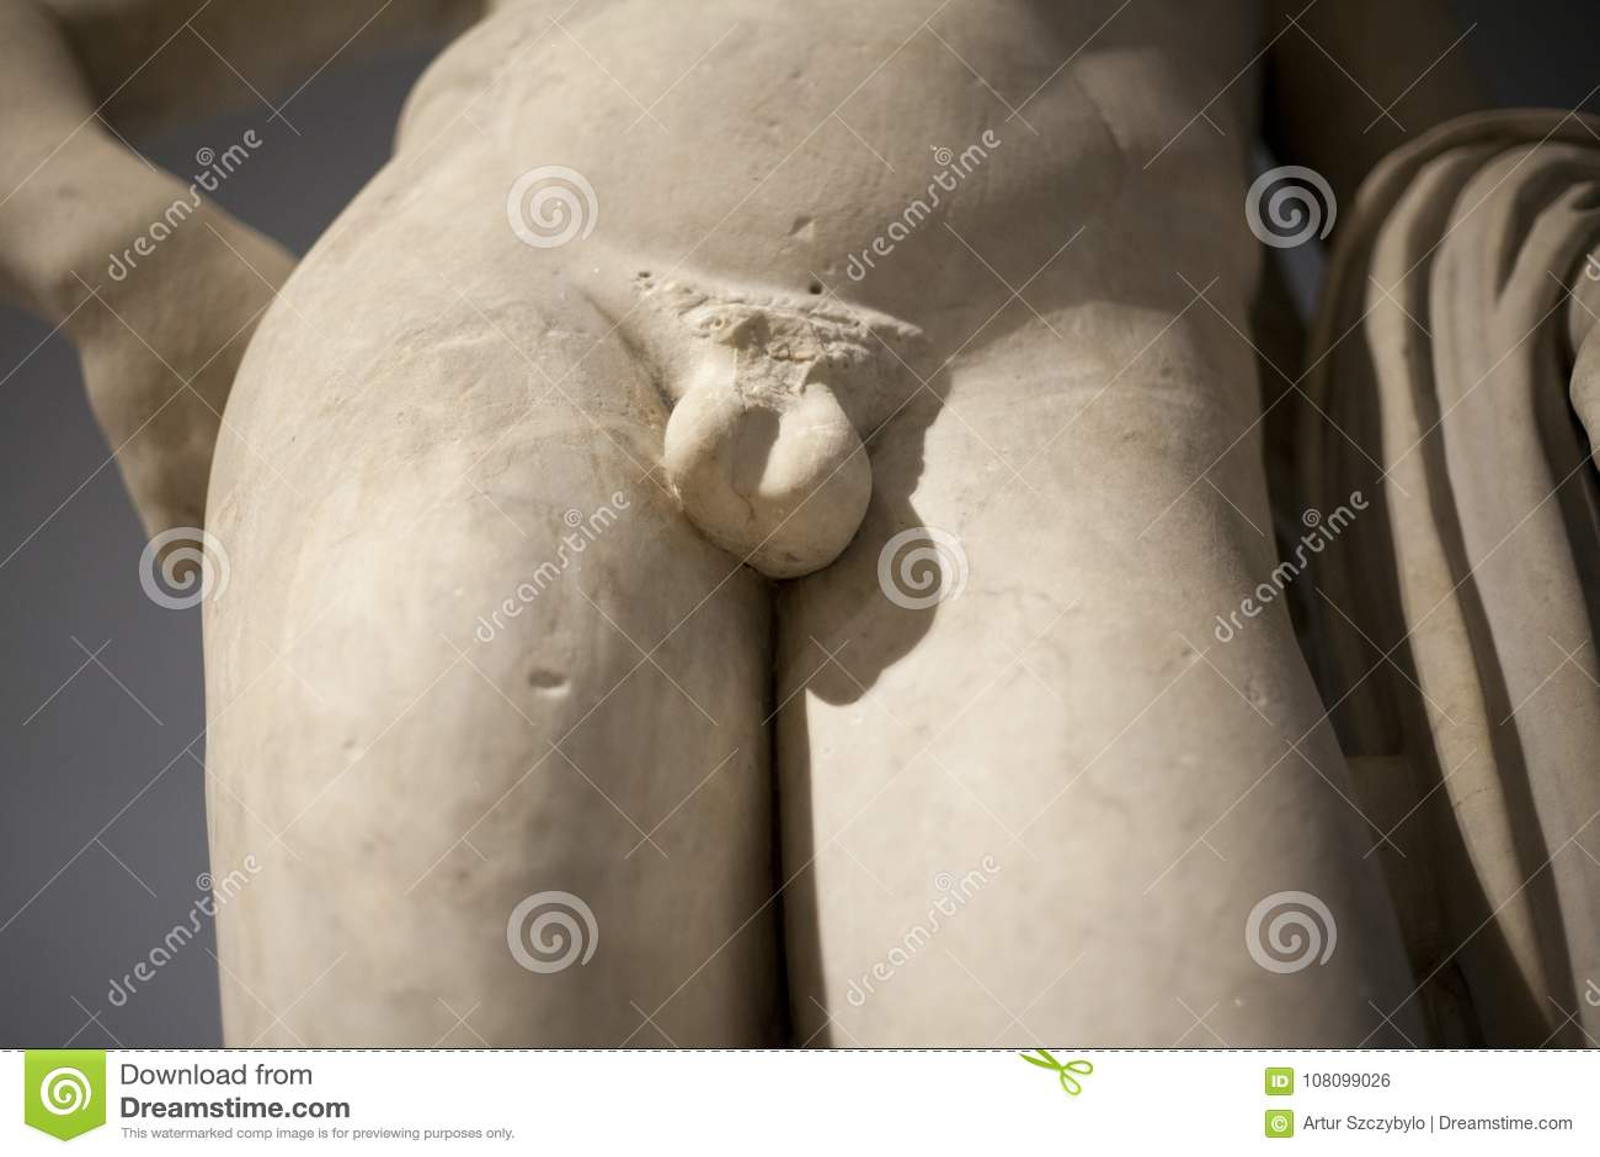 Close-up penis pics Bekijk gratis xxx Videos com